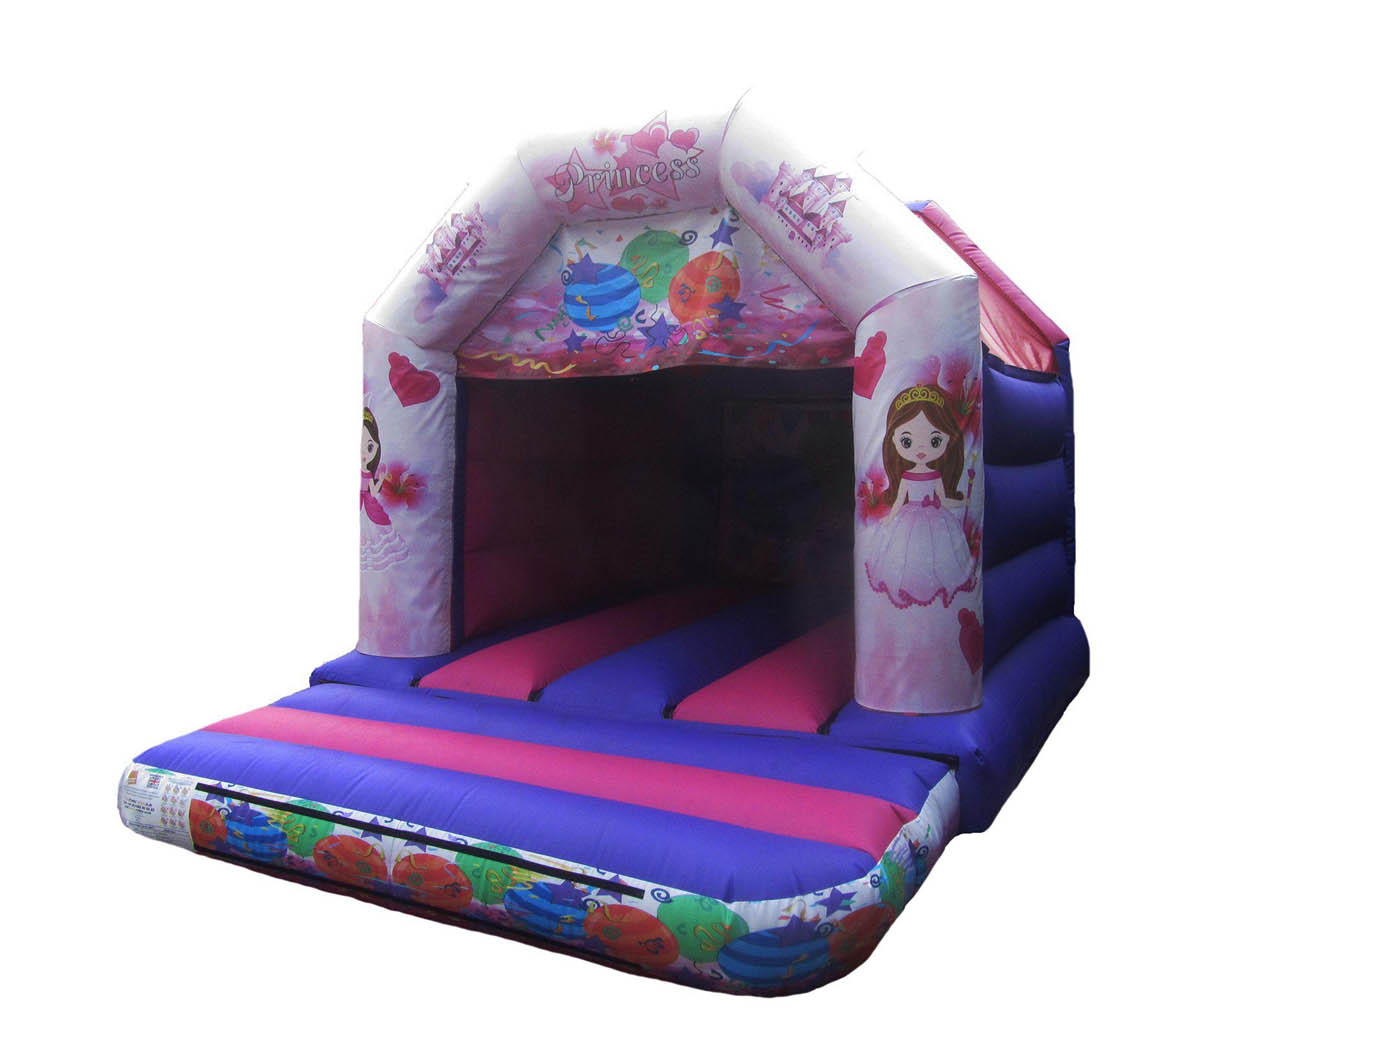 Children's Commercial Bouncy Castle for Sale